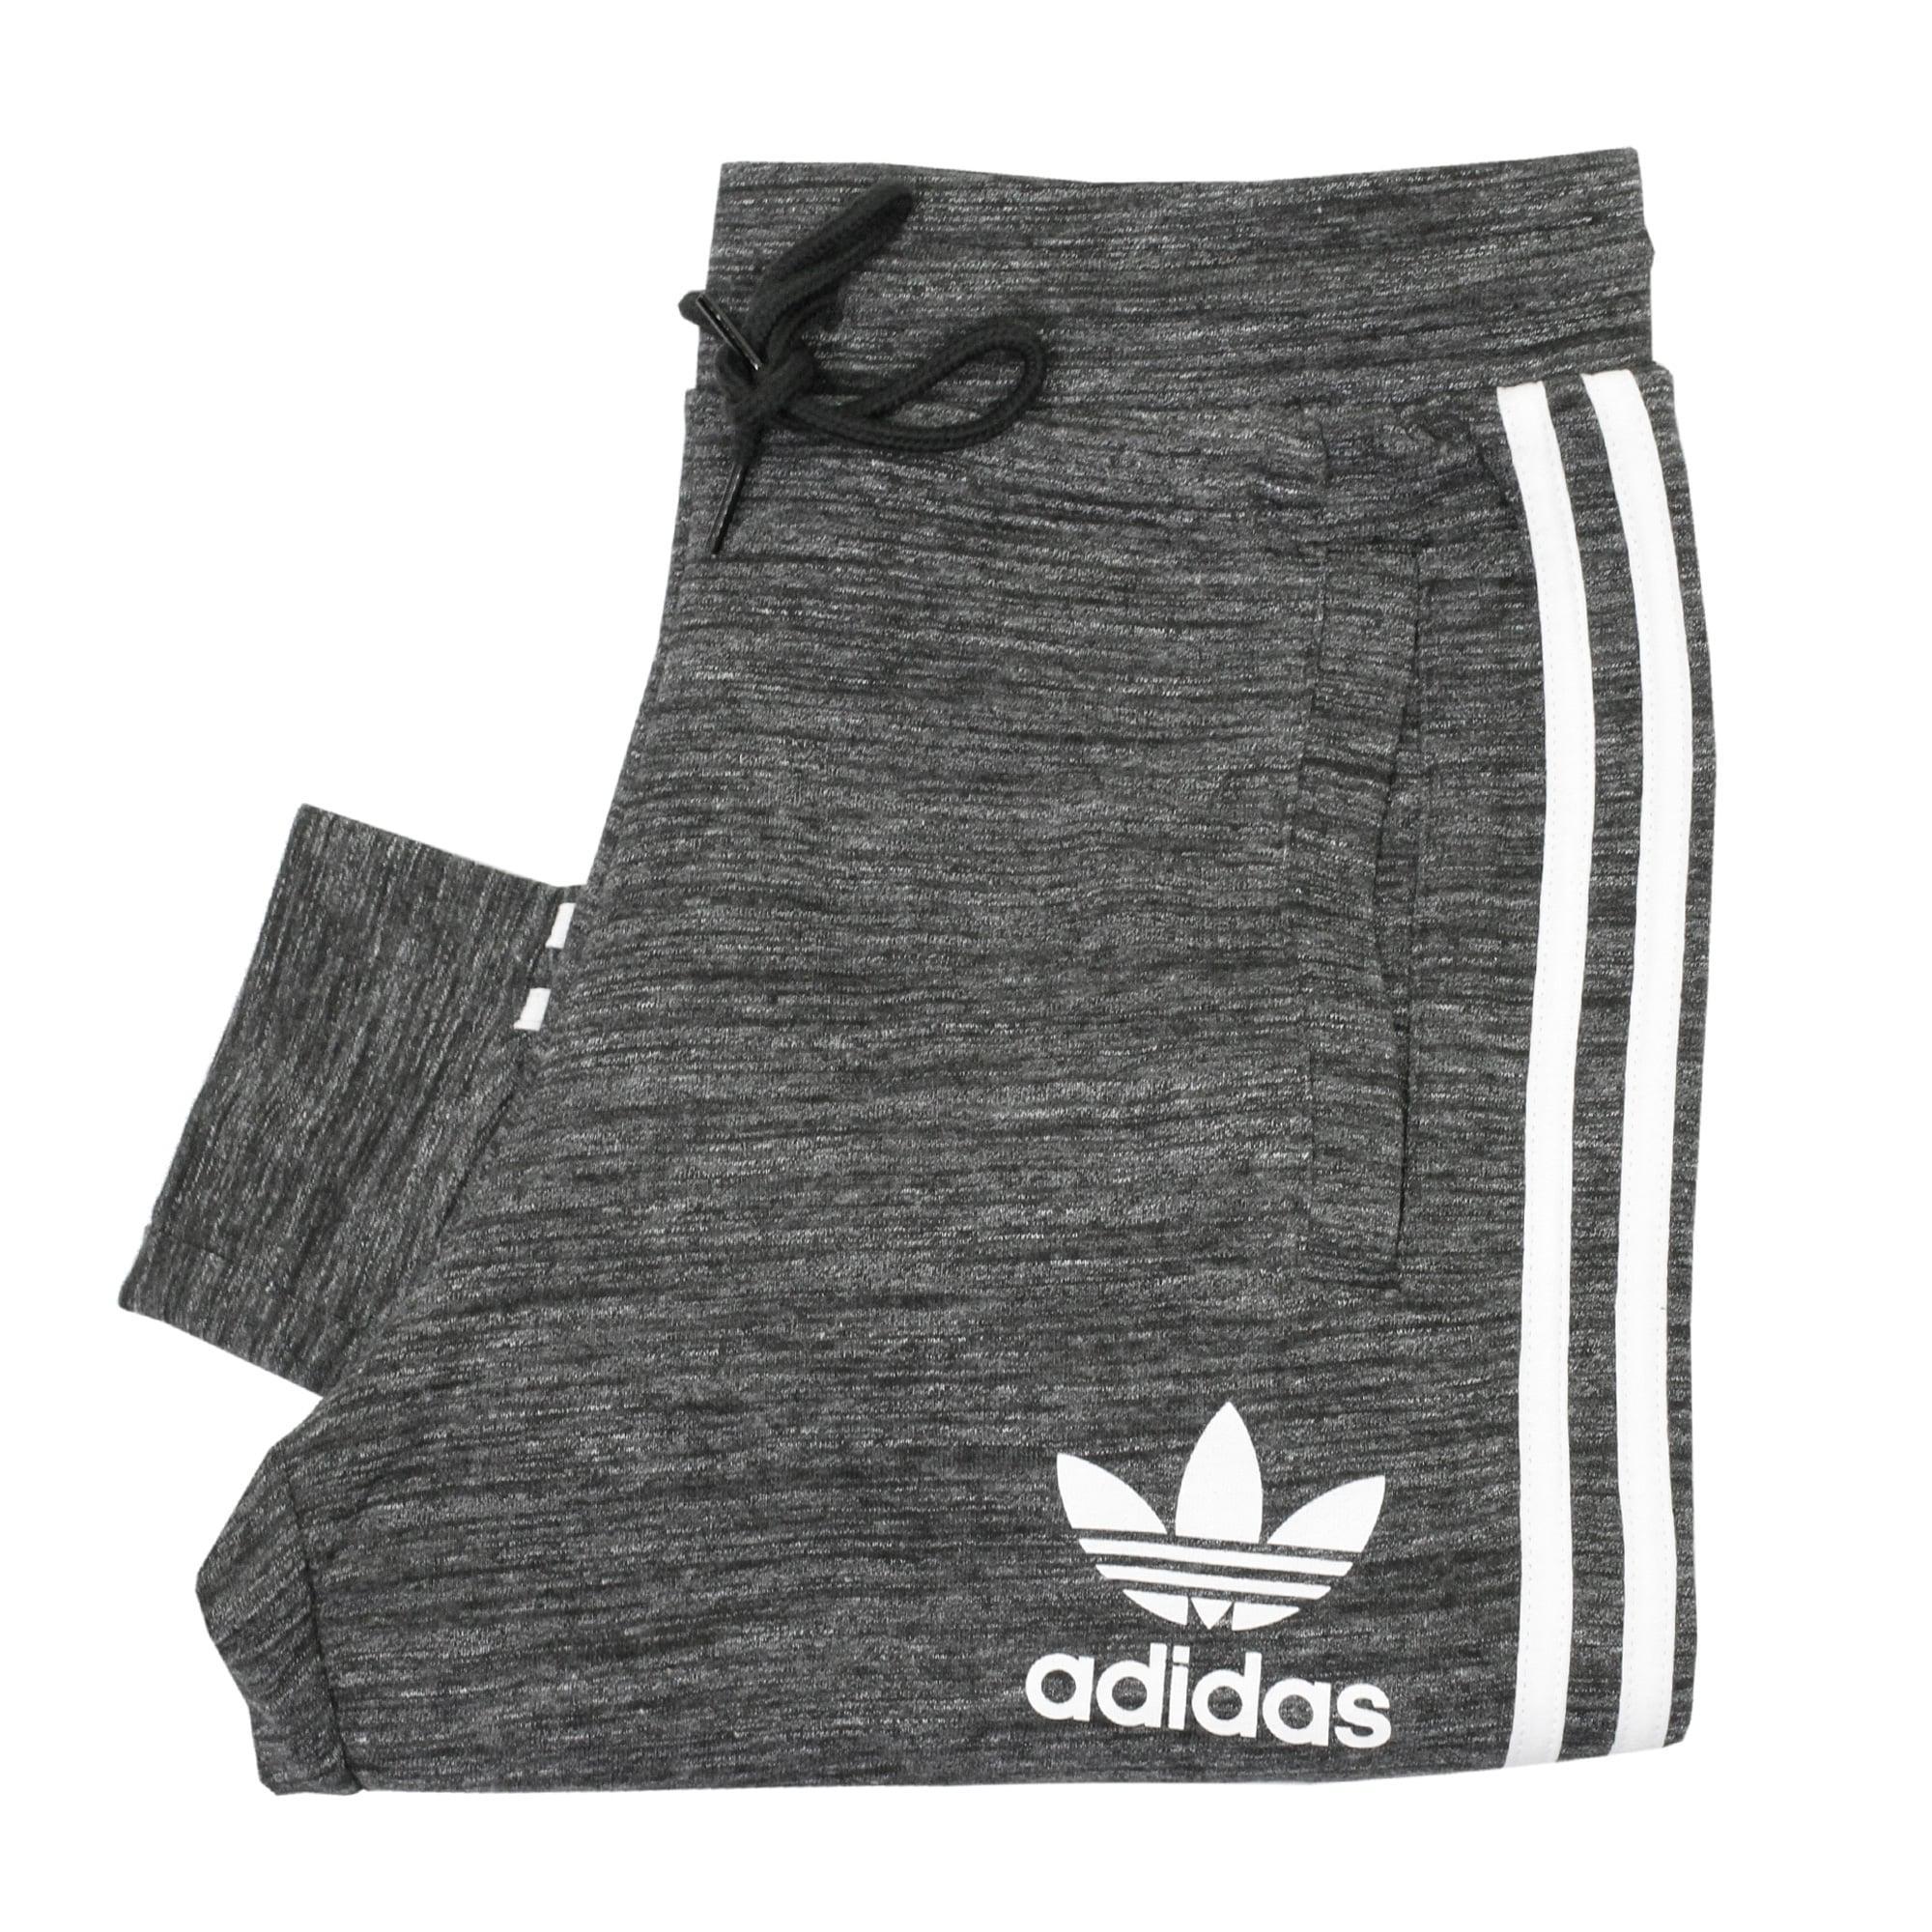 adidas Originals Rubber Clfn Ft Black Track Pants for Men Lyst